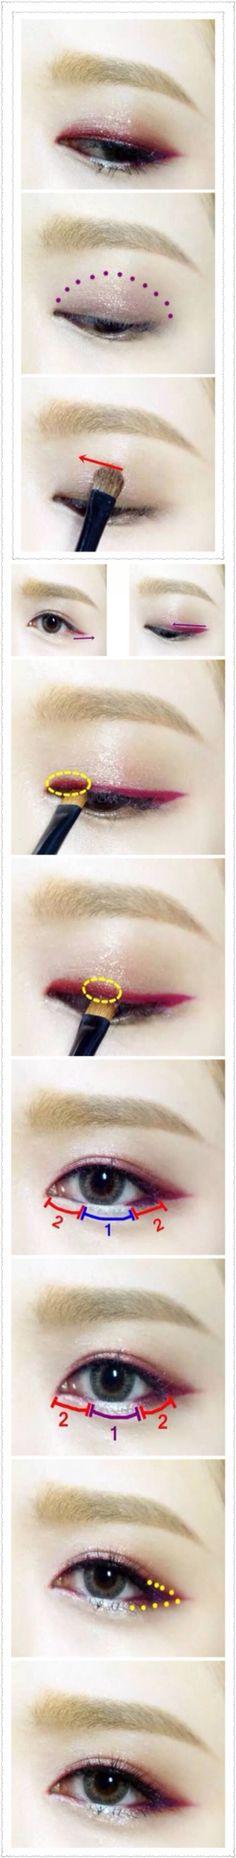 Korean smoky eye make up #make up #idea